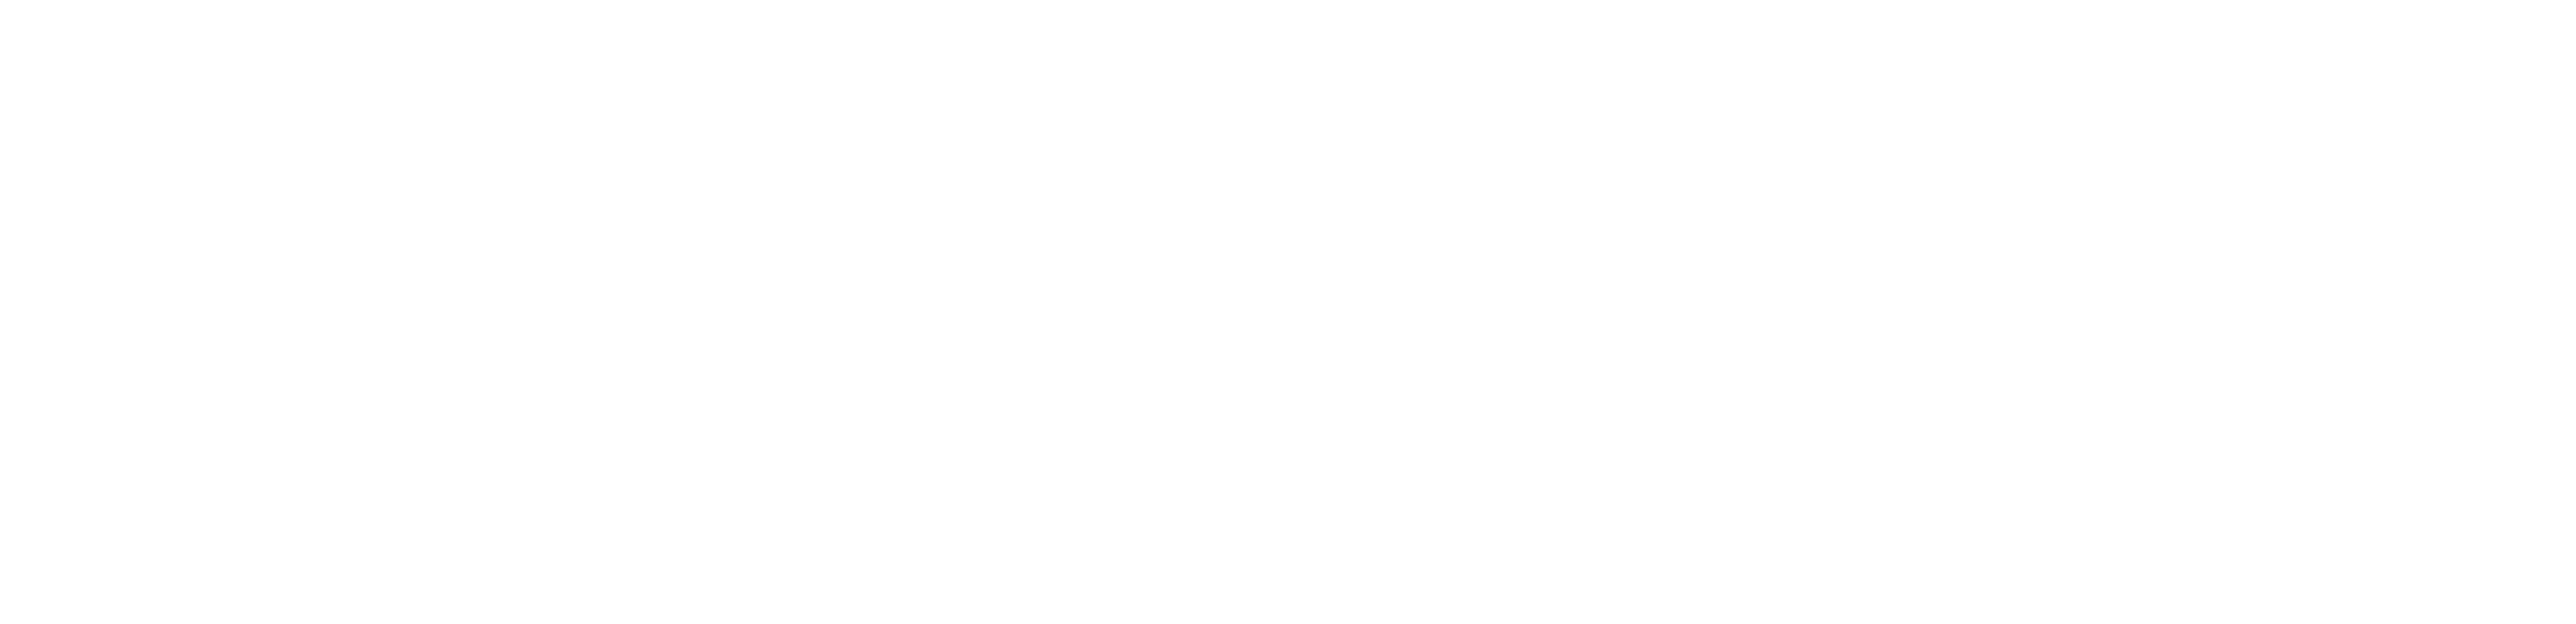 Loft-ist.com